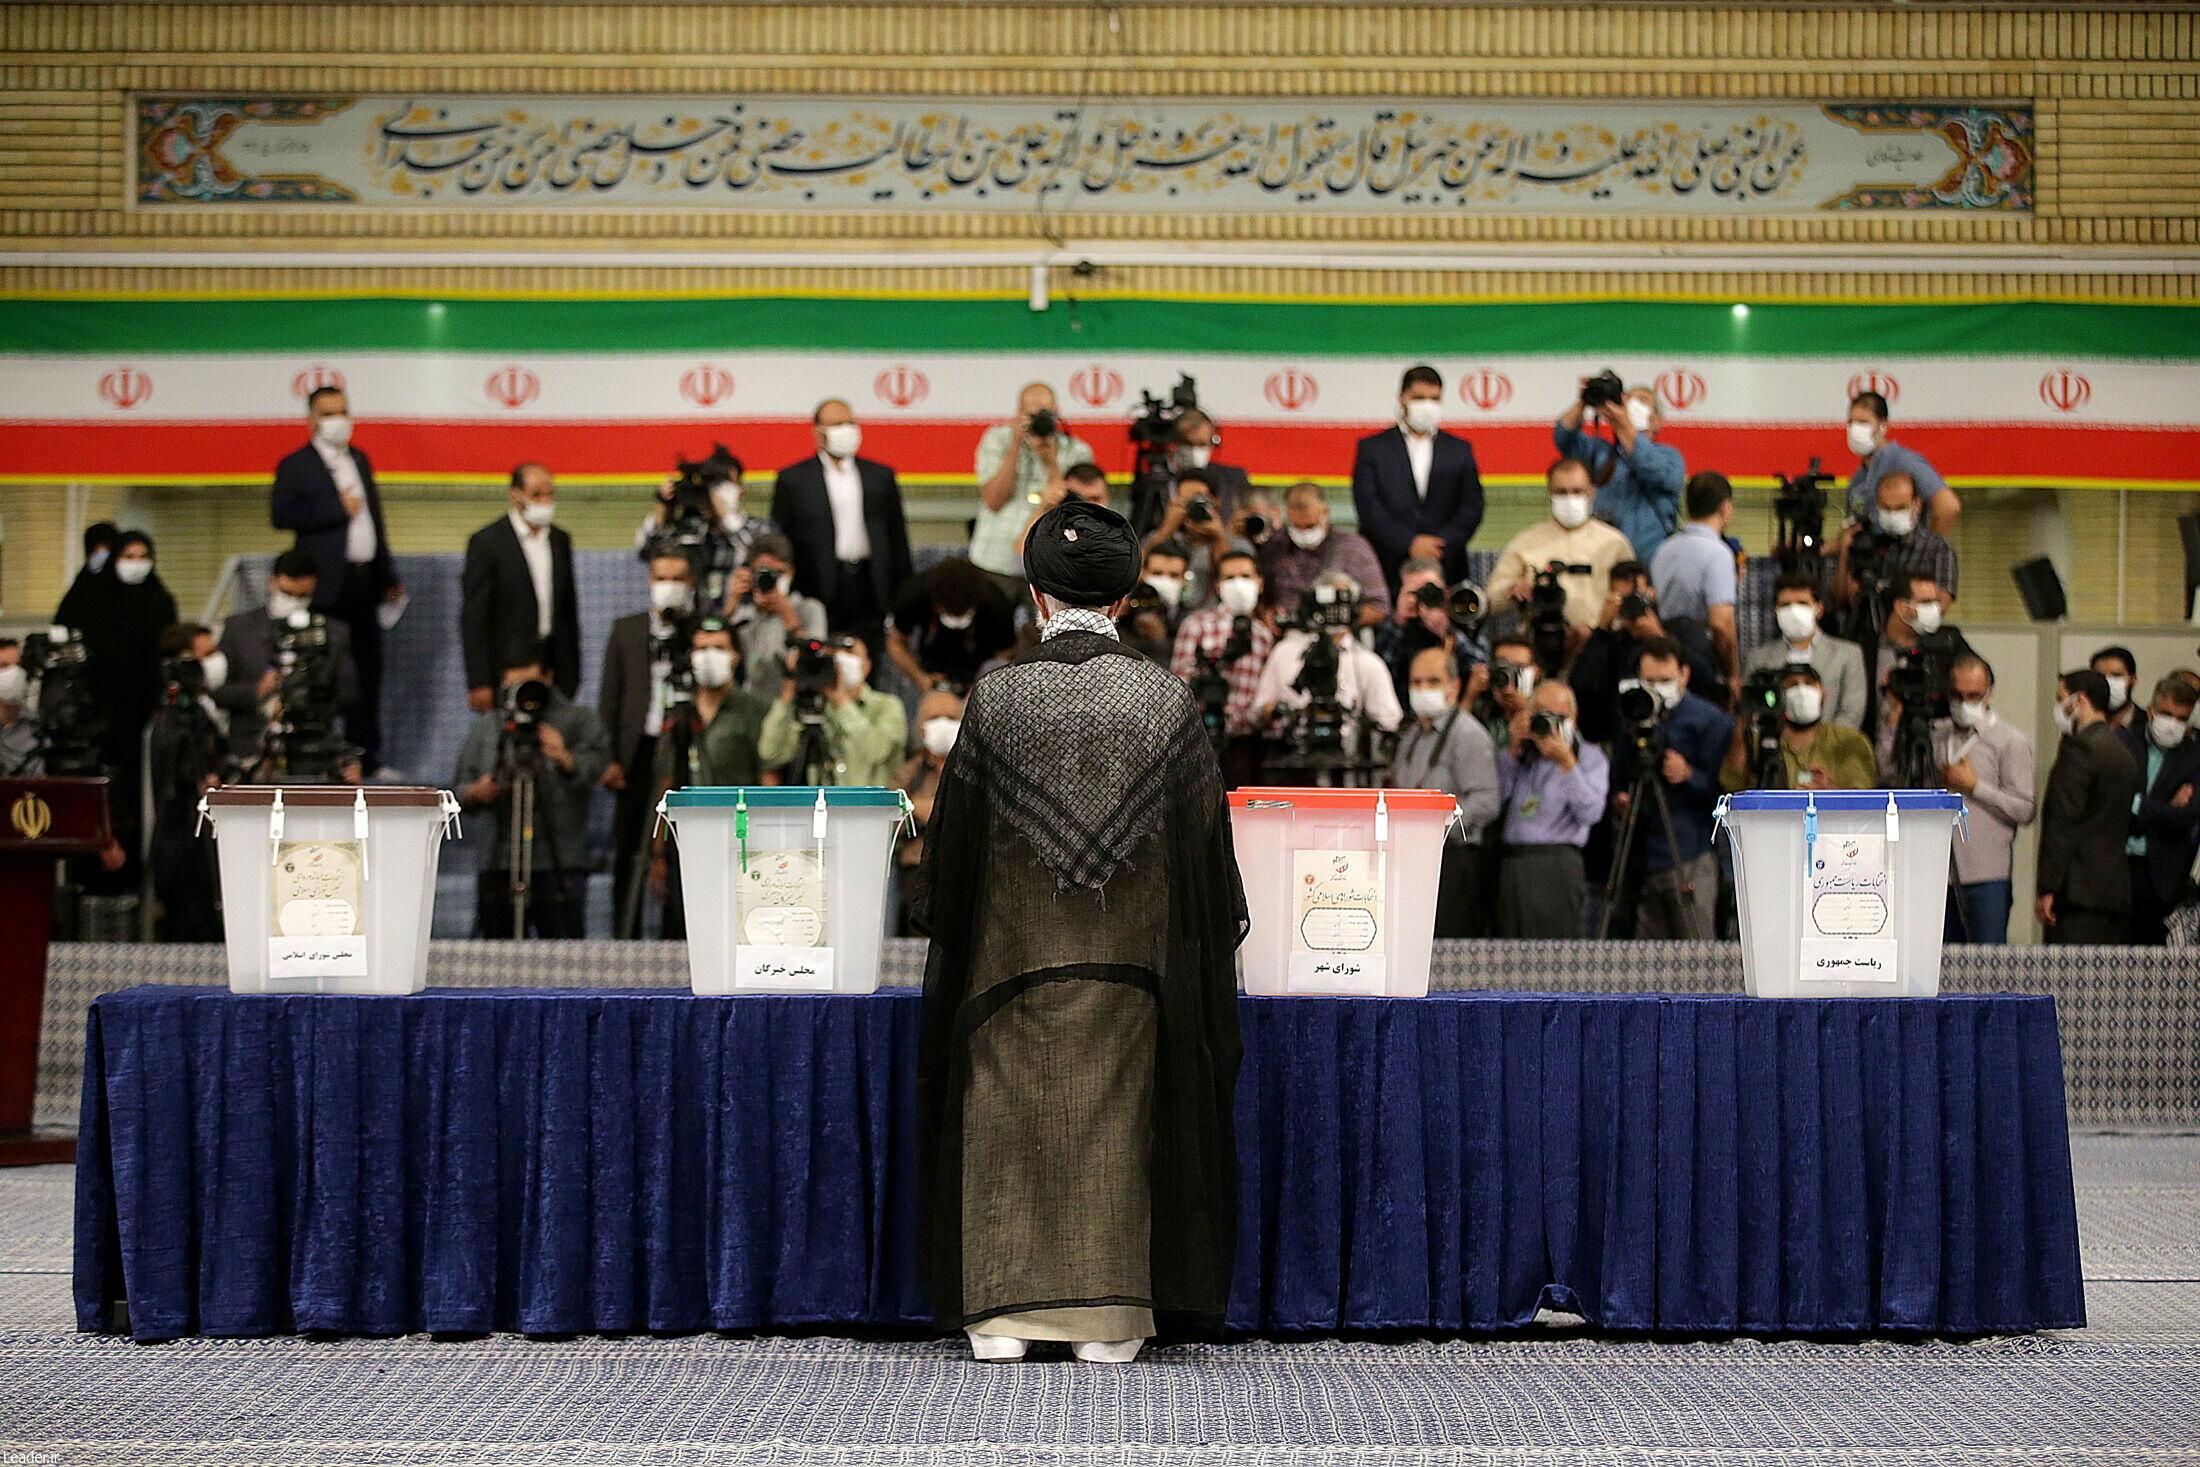 2021-06-18T074456Z_748419877_RC2U2O9IG1UE_RTRMADP_3_IRAN-ELECTION